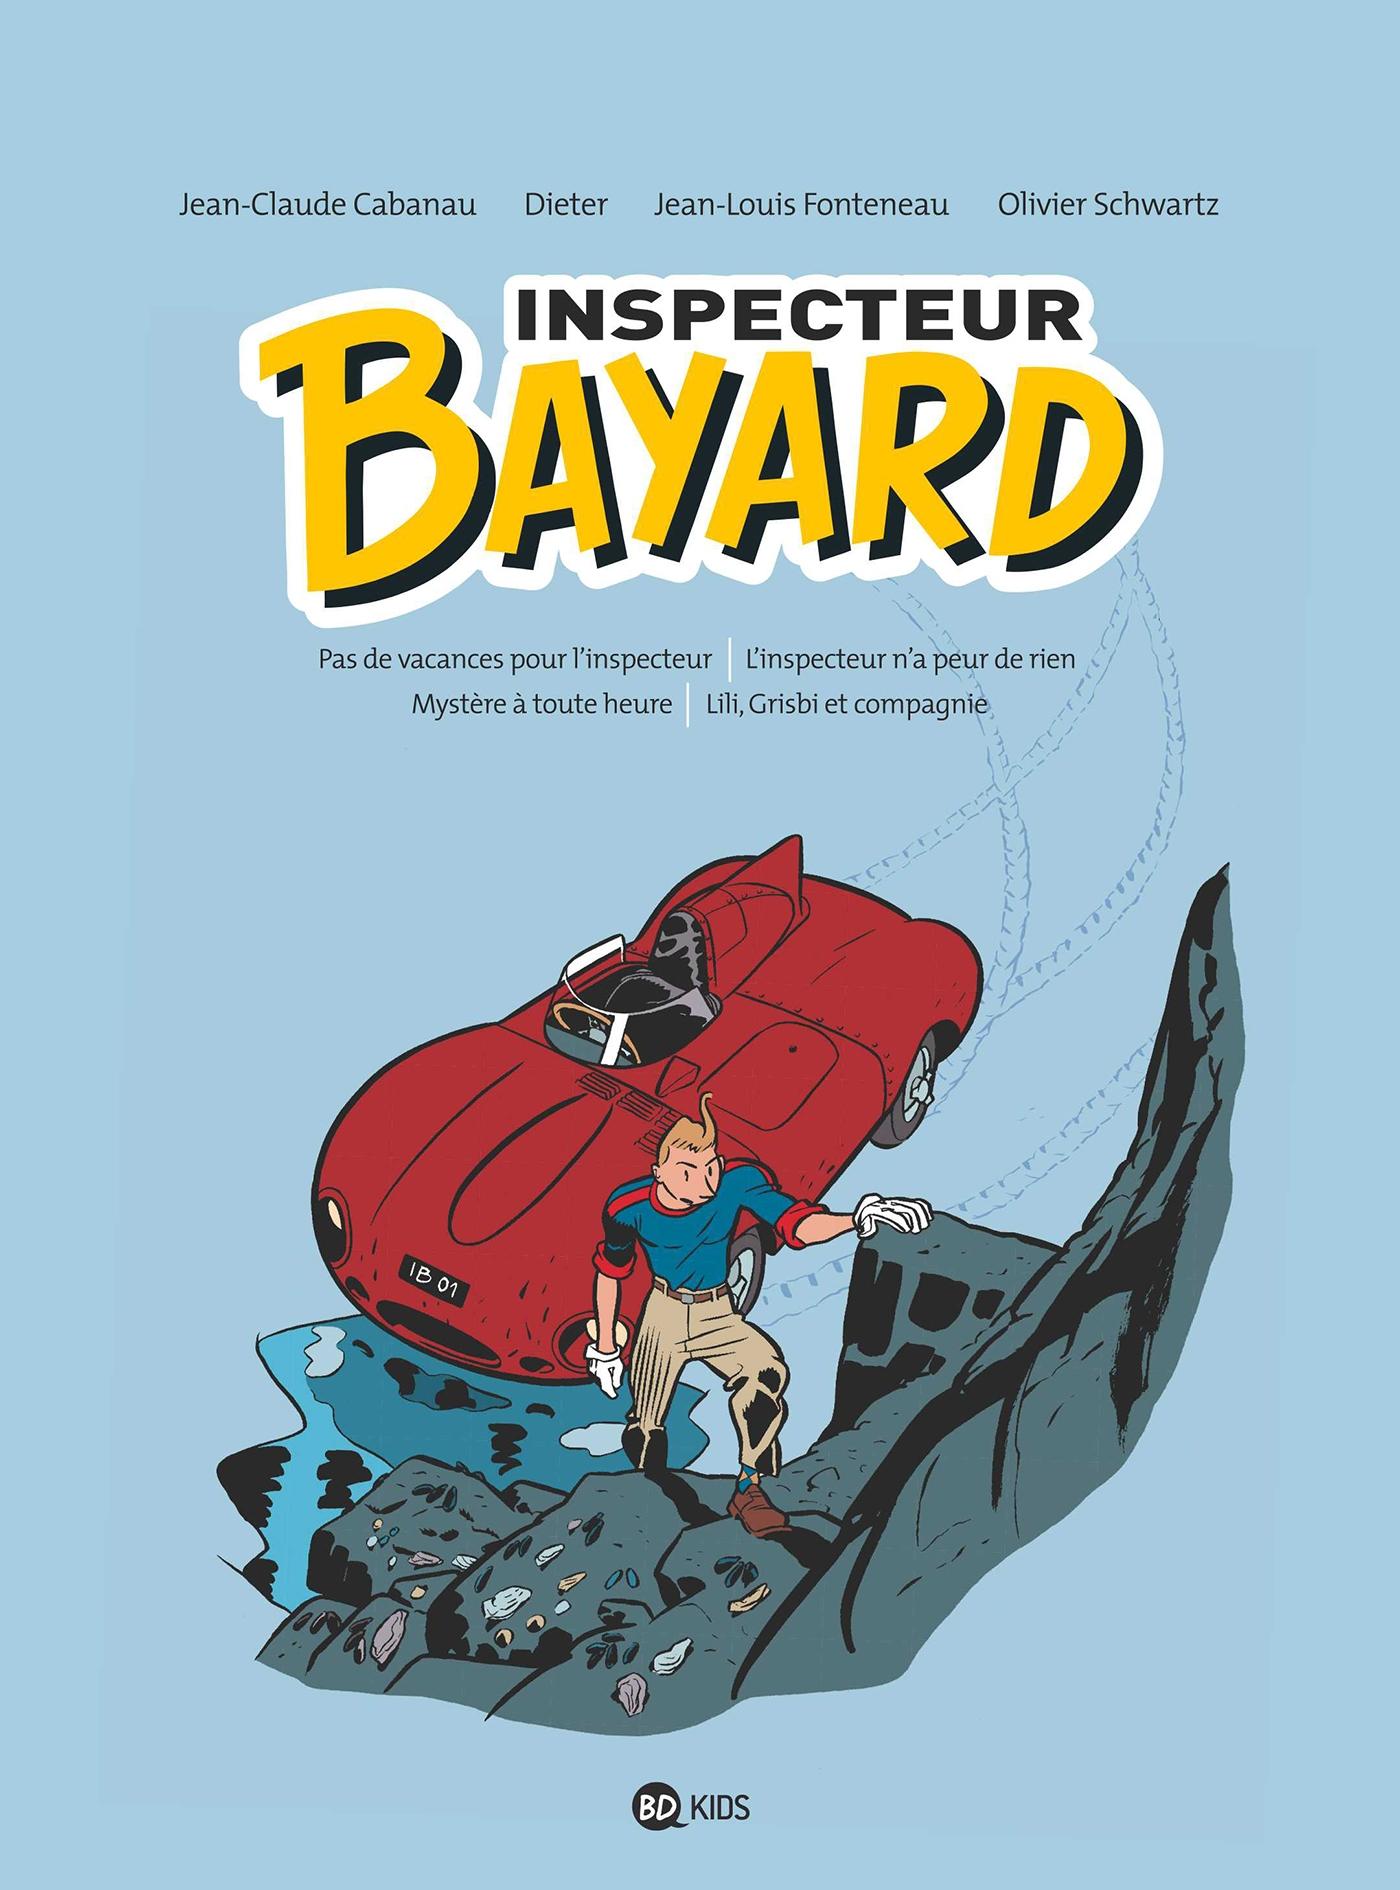 INSPECTEUR BAYARD INTEGRALE, TOME 01 - INSPECTEUR BAYARD - INTEGRALE T01